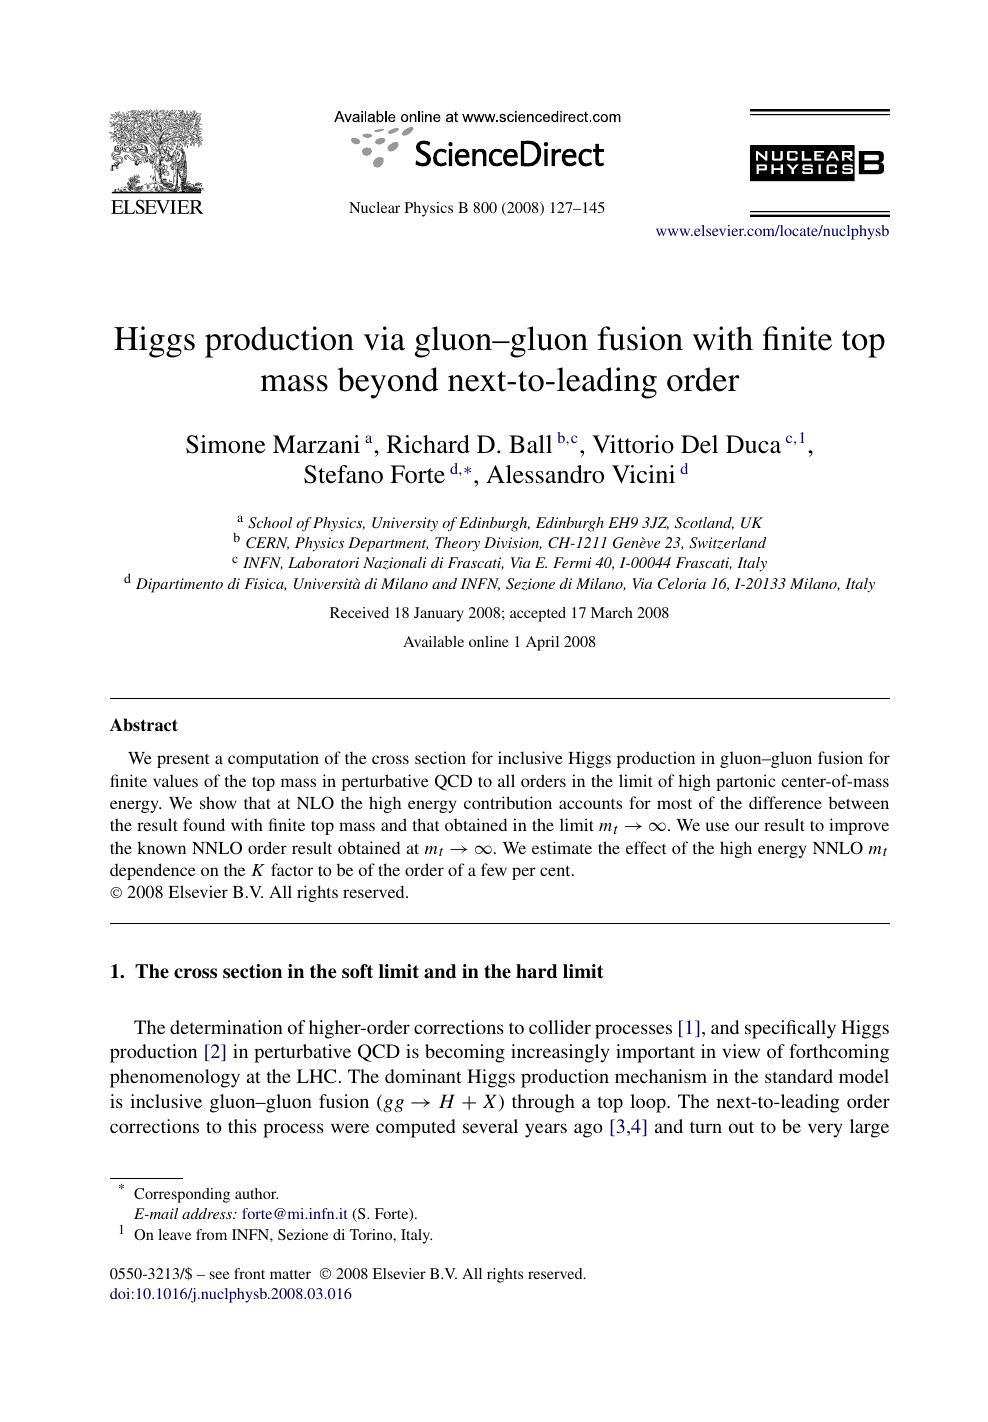 Higgs production via gluon–gluon fusion with finite top mass